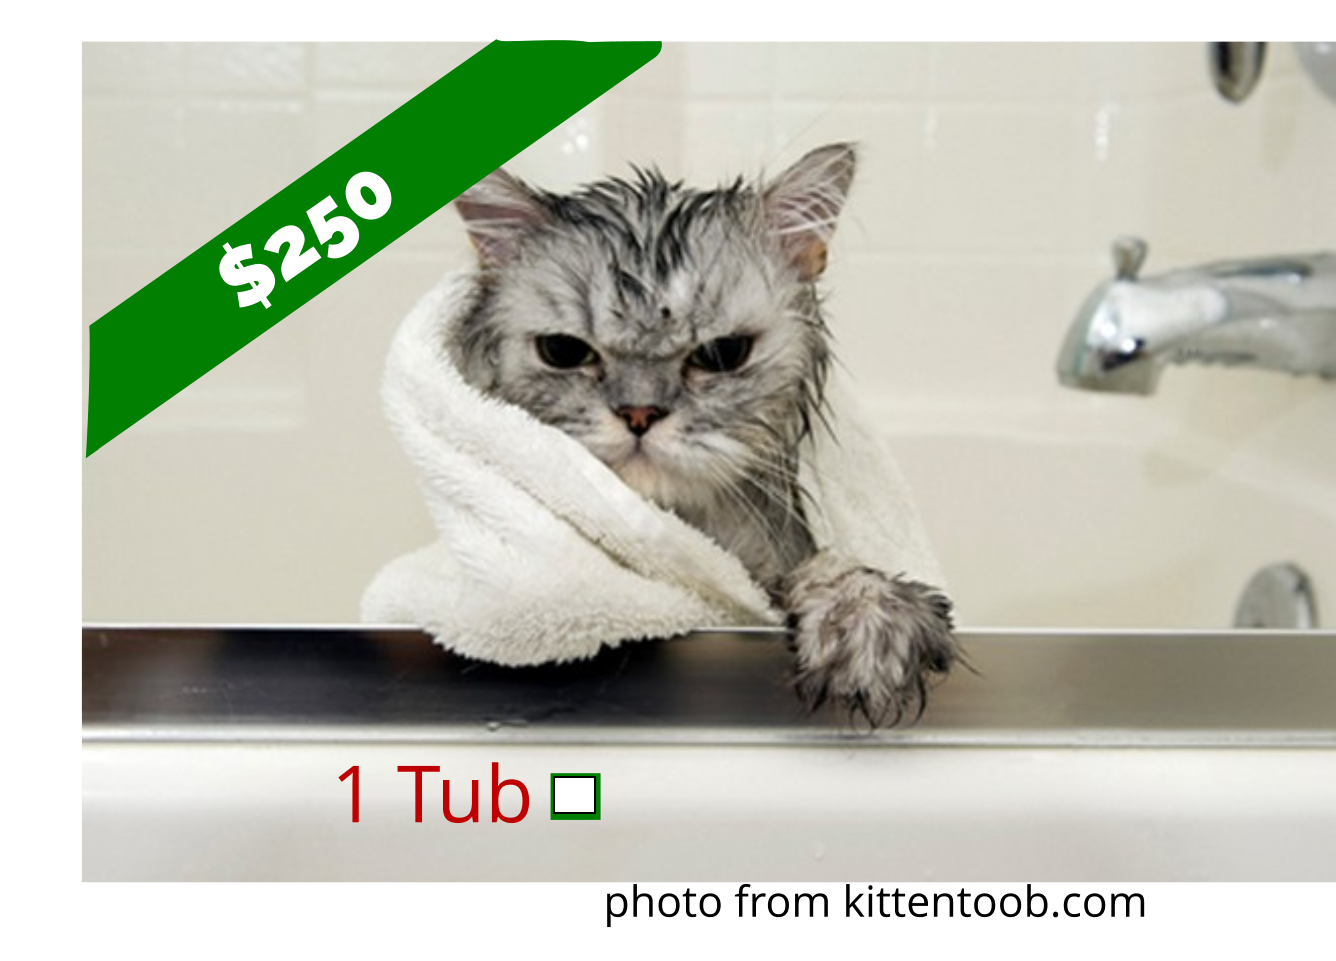 One Tub